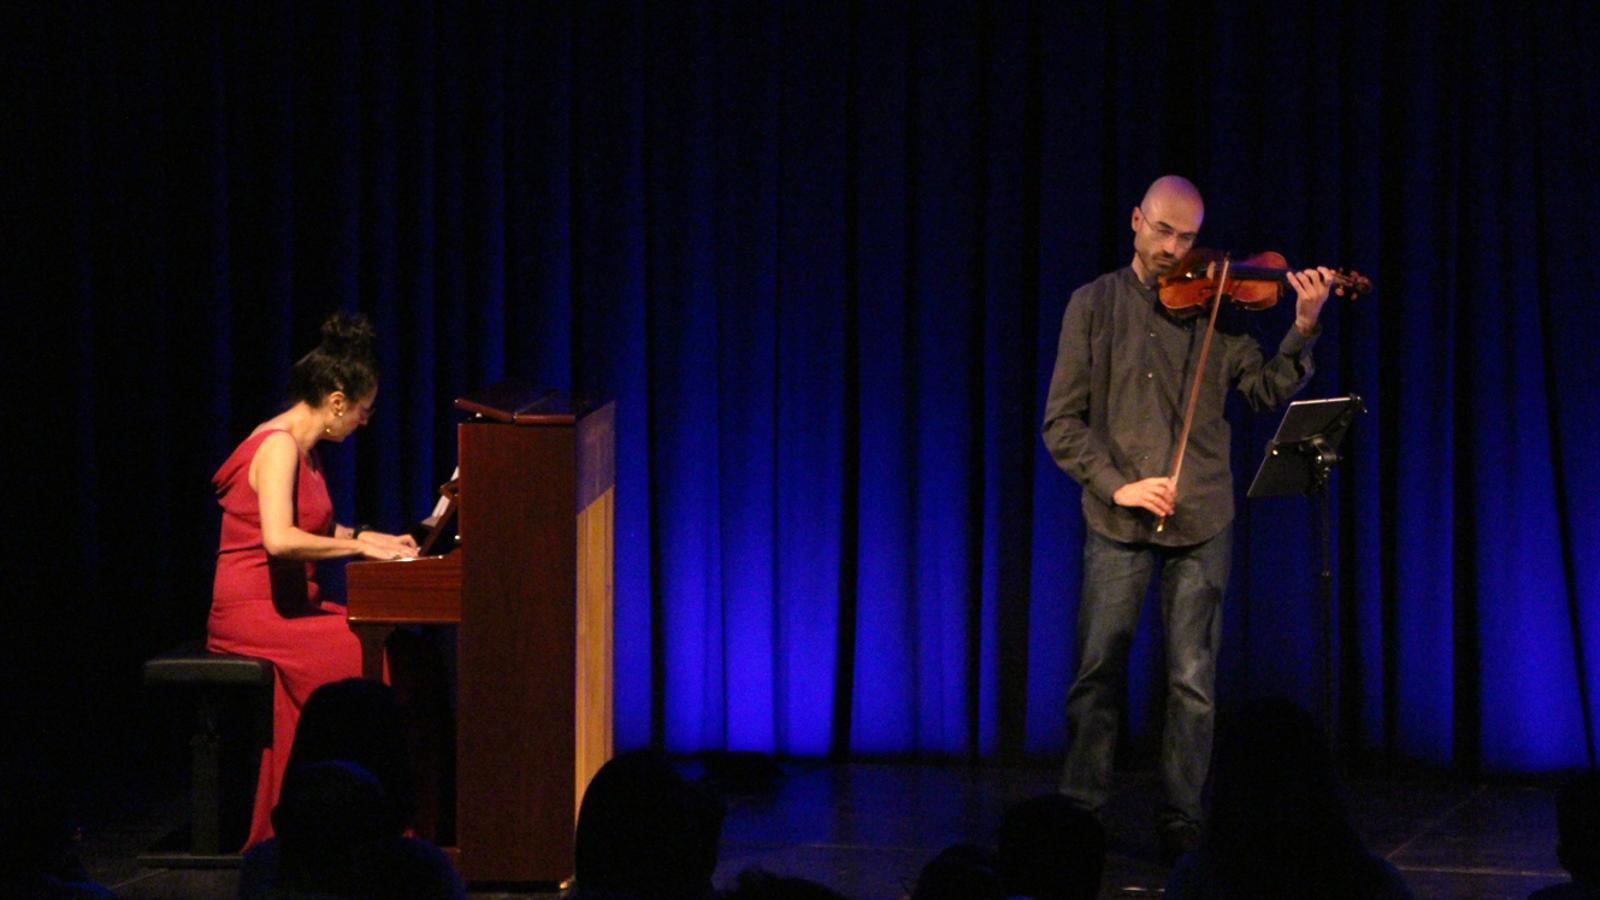 Actuació de Duo de cine en el marc del festival Ull Nu. / T. N. (ANA)